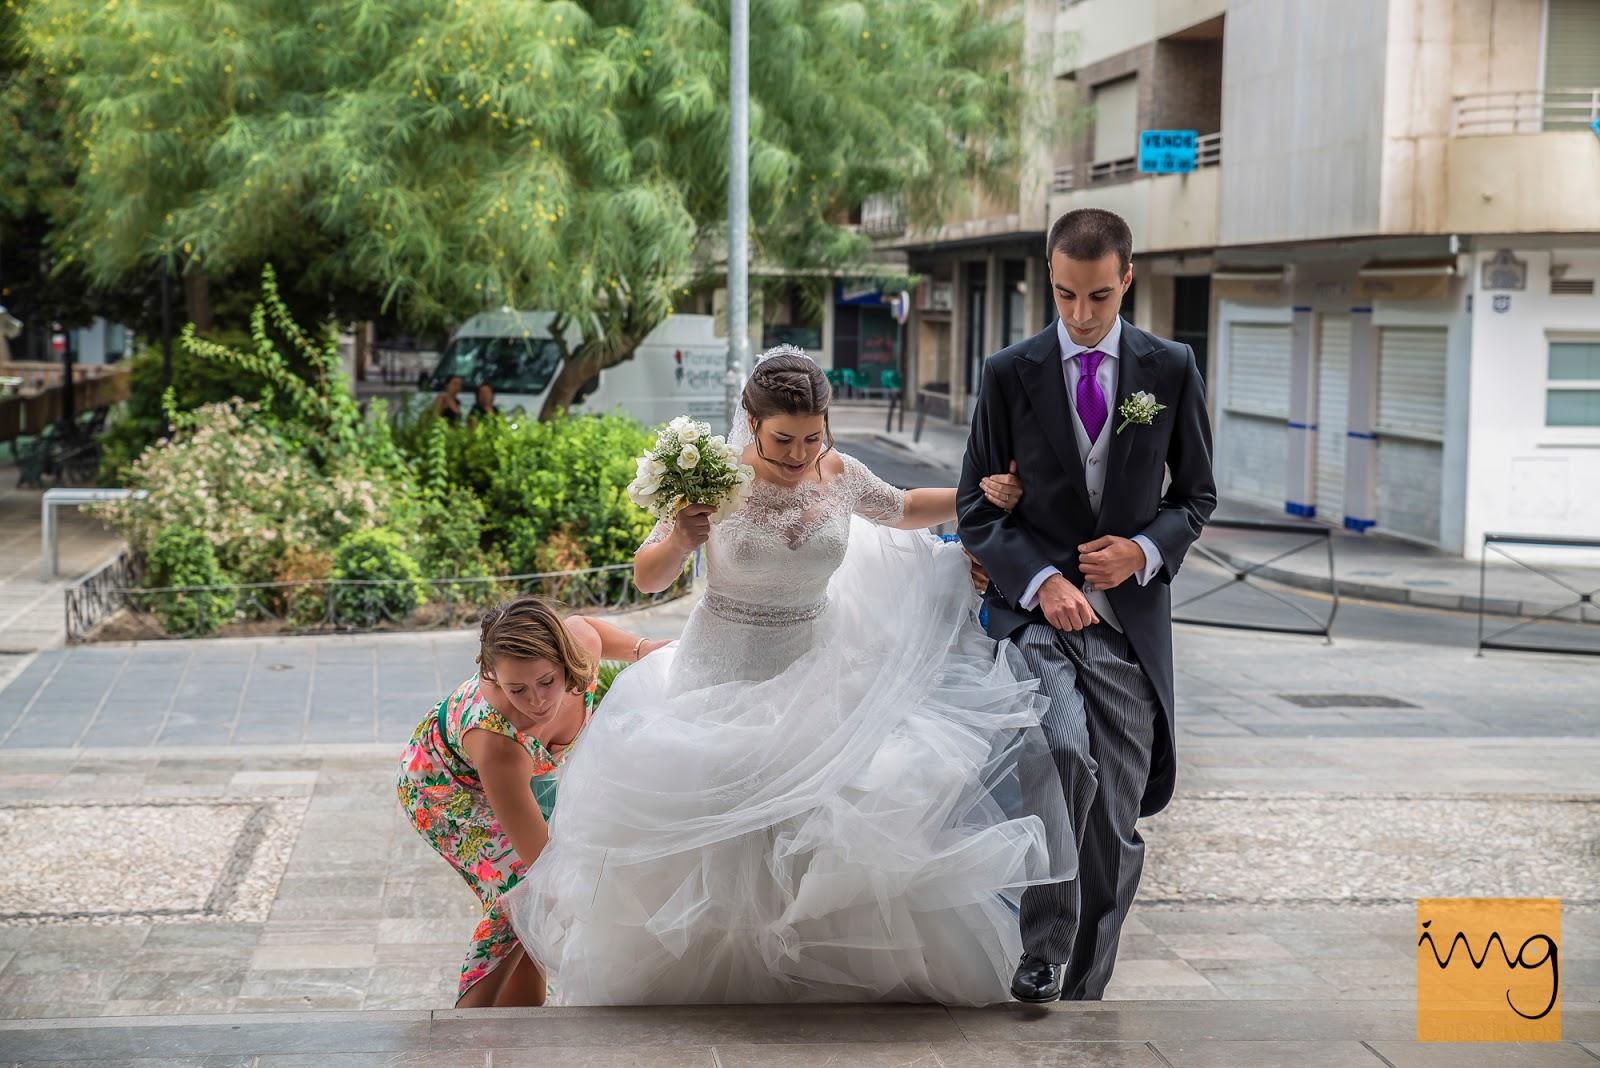 Fotografía de boda, entrando a la Iglesia